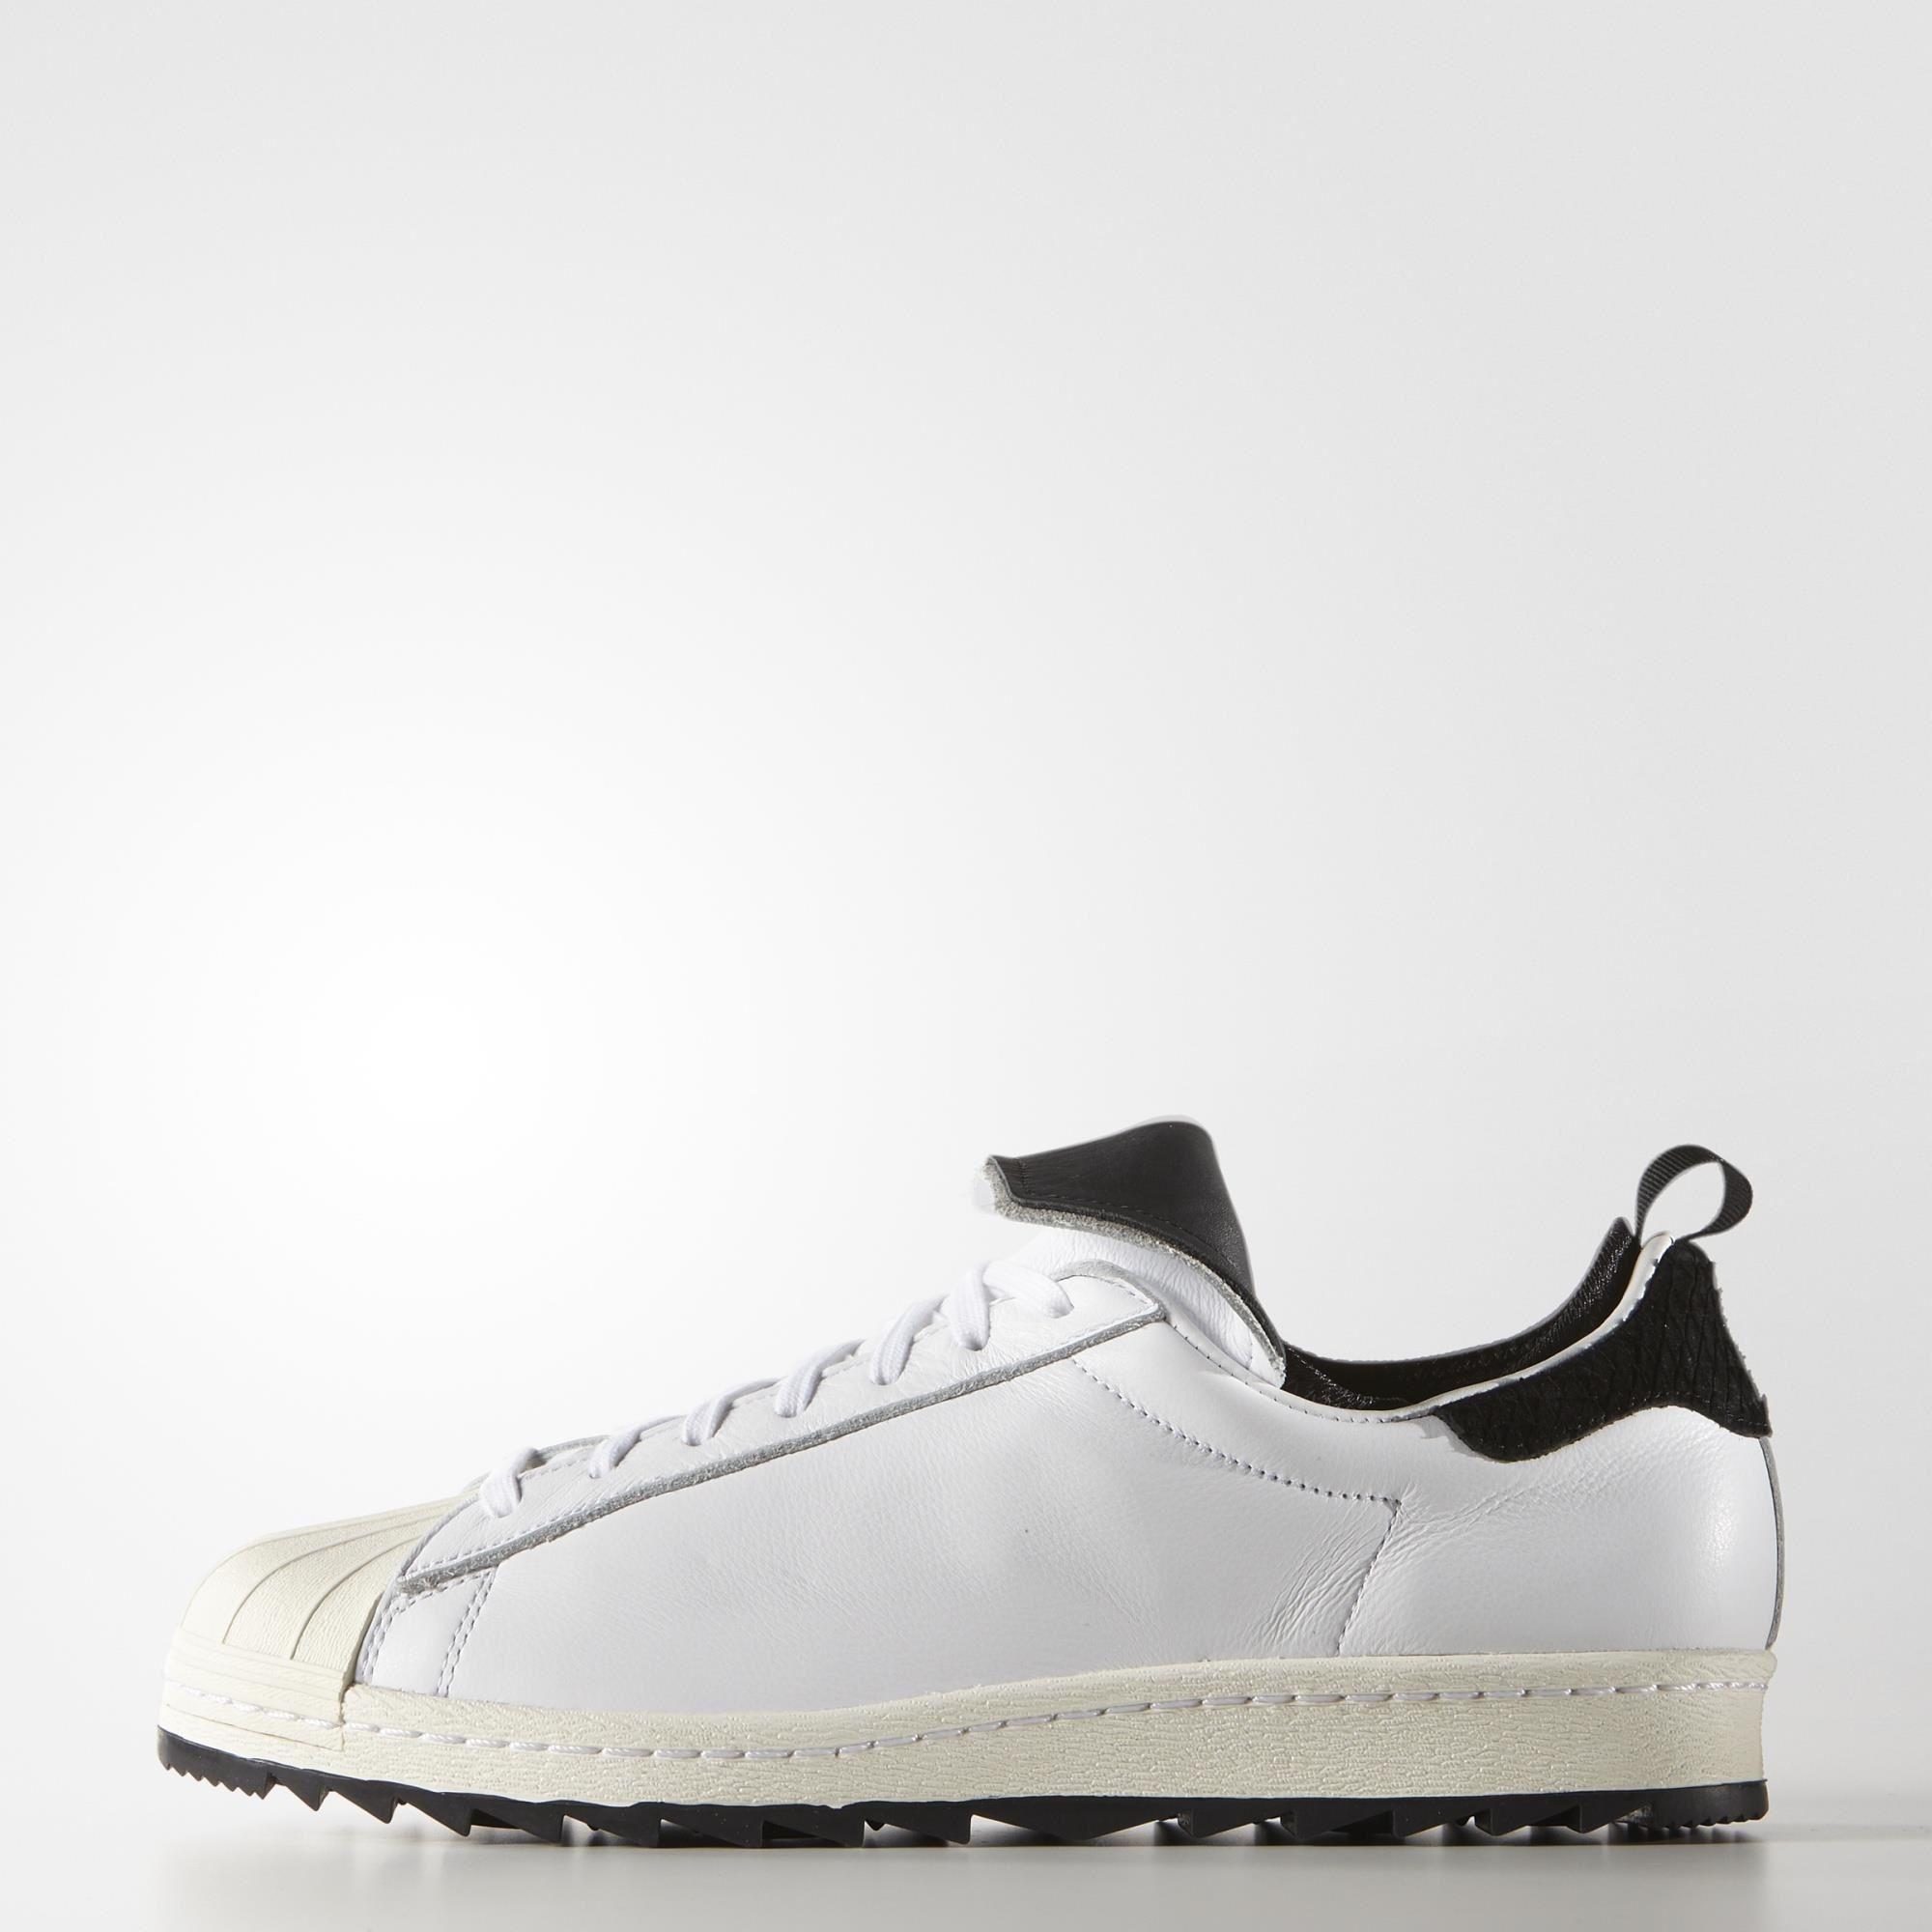 adidas men's superstar 80s sneakers reebok dor bakery logo